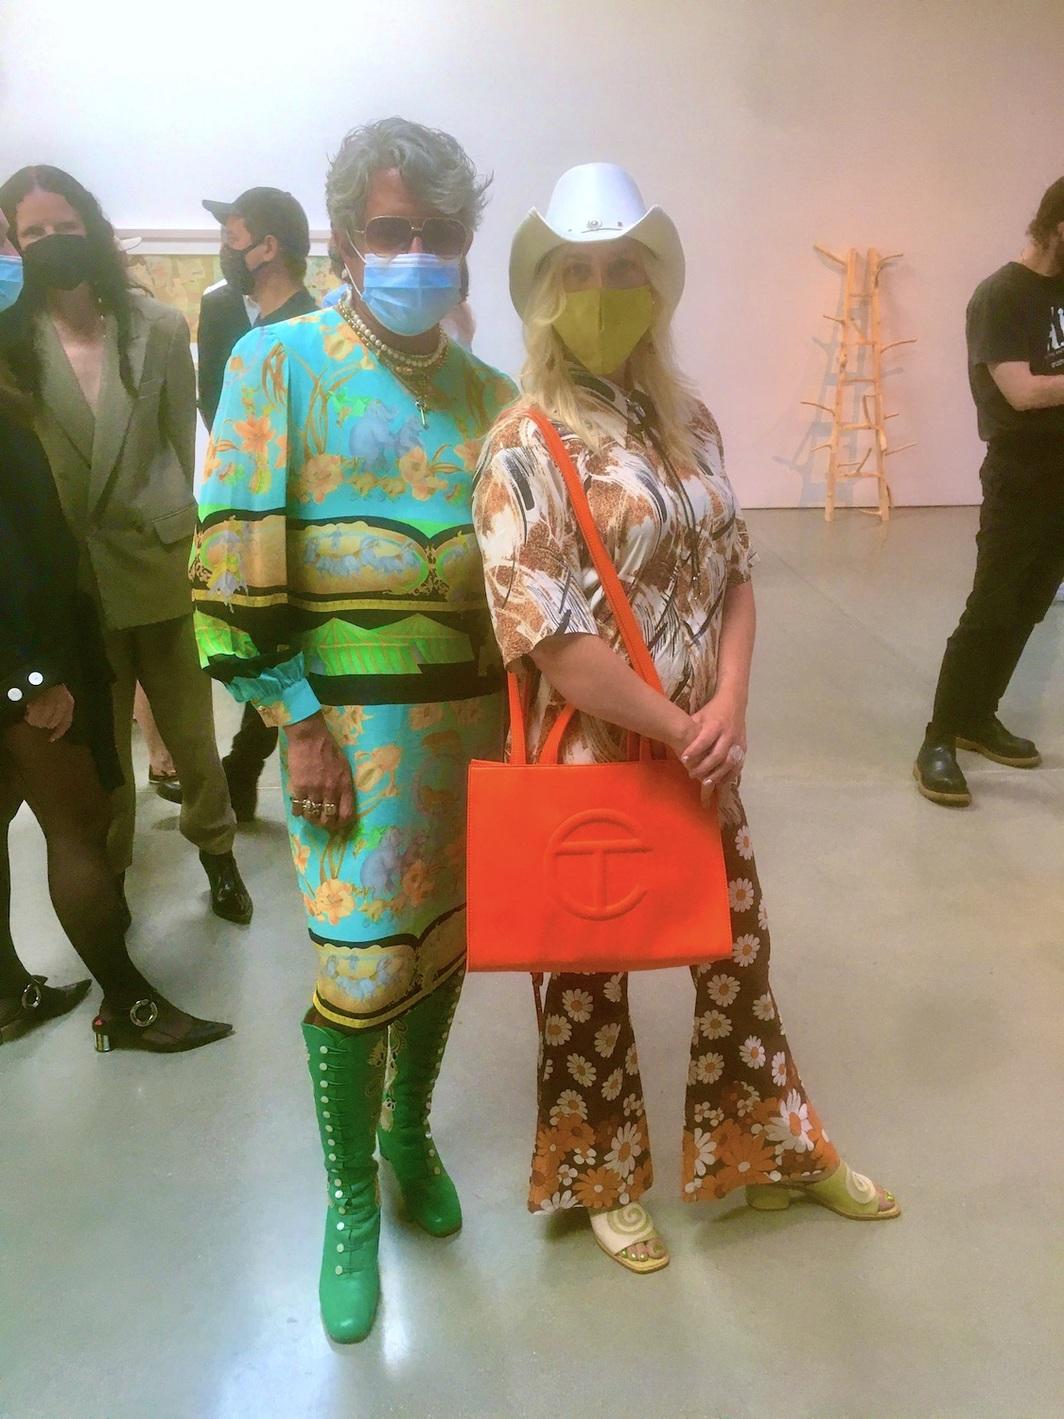 Artists Raul de Nieves and Whitney Vangren. Photo: Chloe Wyma.